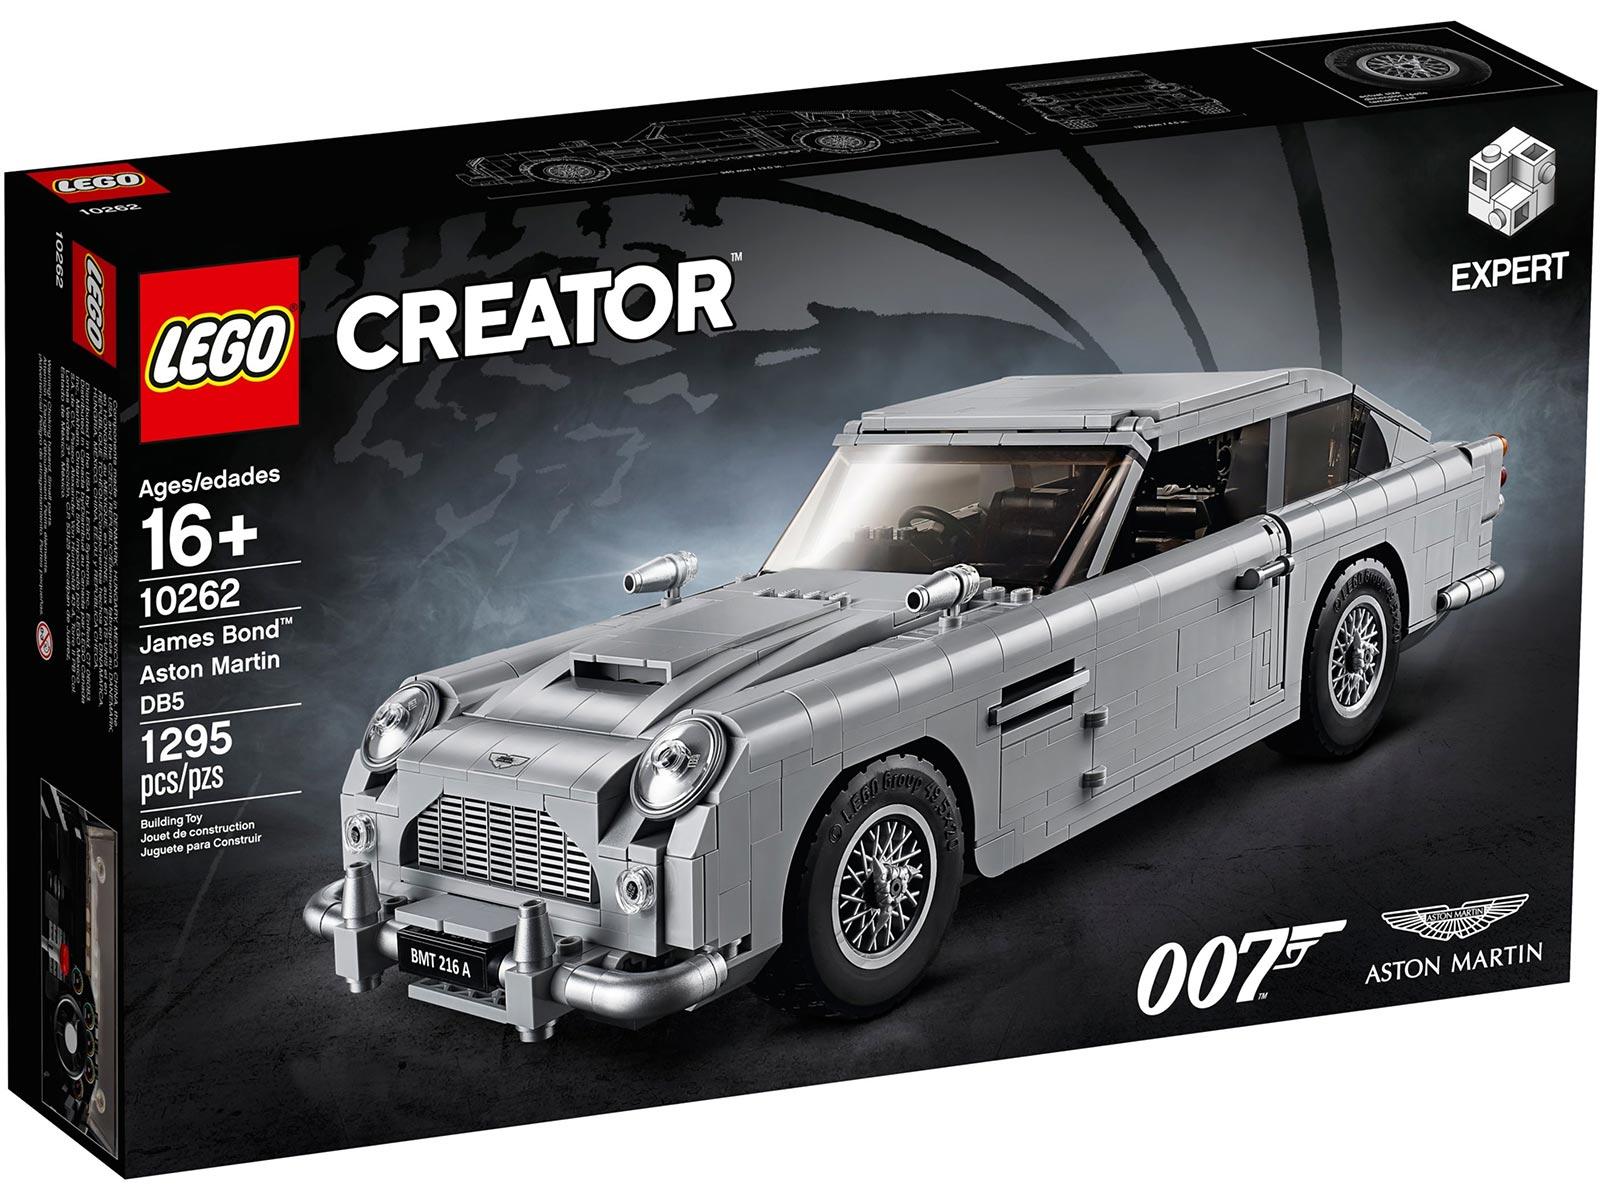 LEGO Creator James Bond Aston Martin DB5 Box